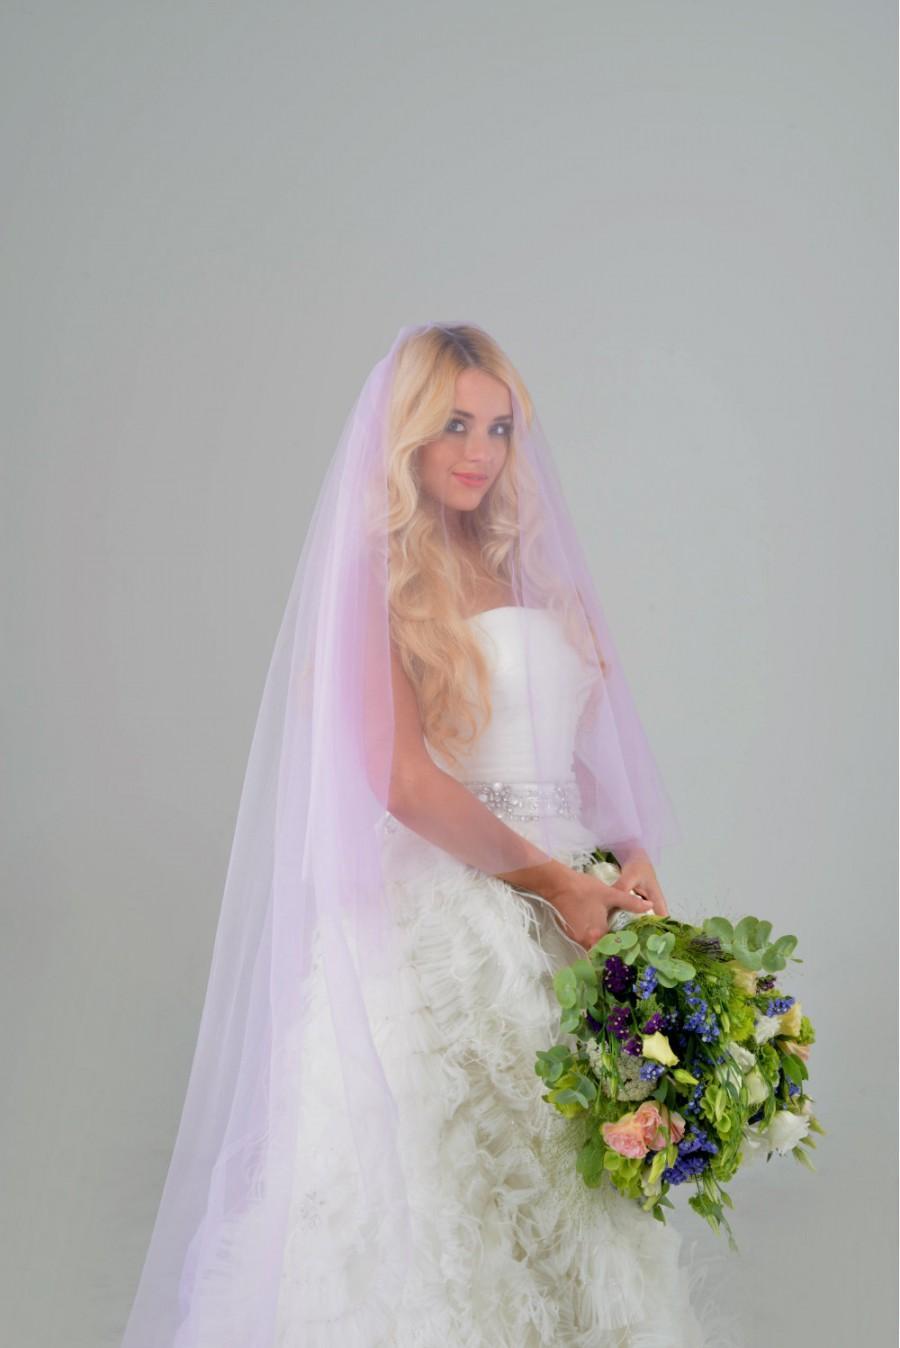 Mariage - purple veil,blusher veil,  colorful veil, bridal veil, unique wedding veil, two tier veil, chapel veil, cathedral veil, STYLE 042 BETTY